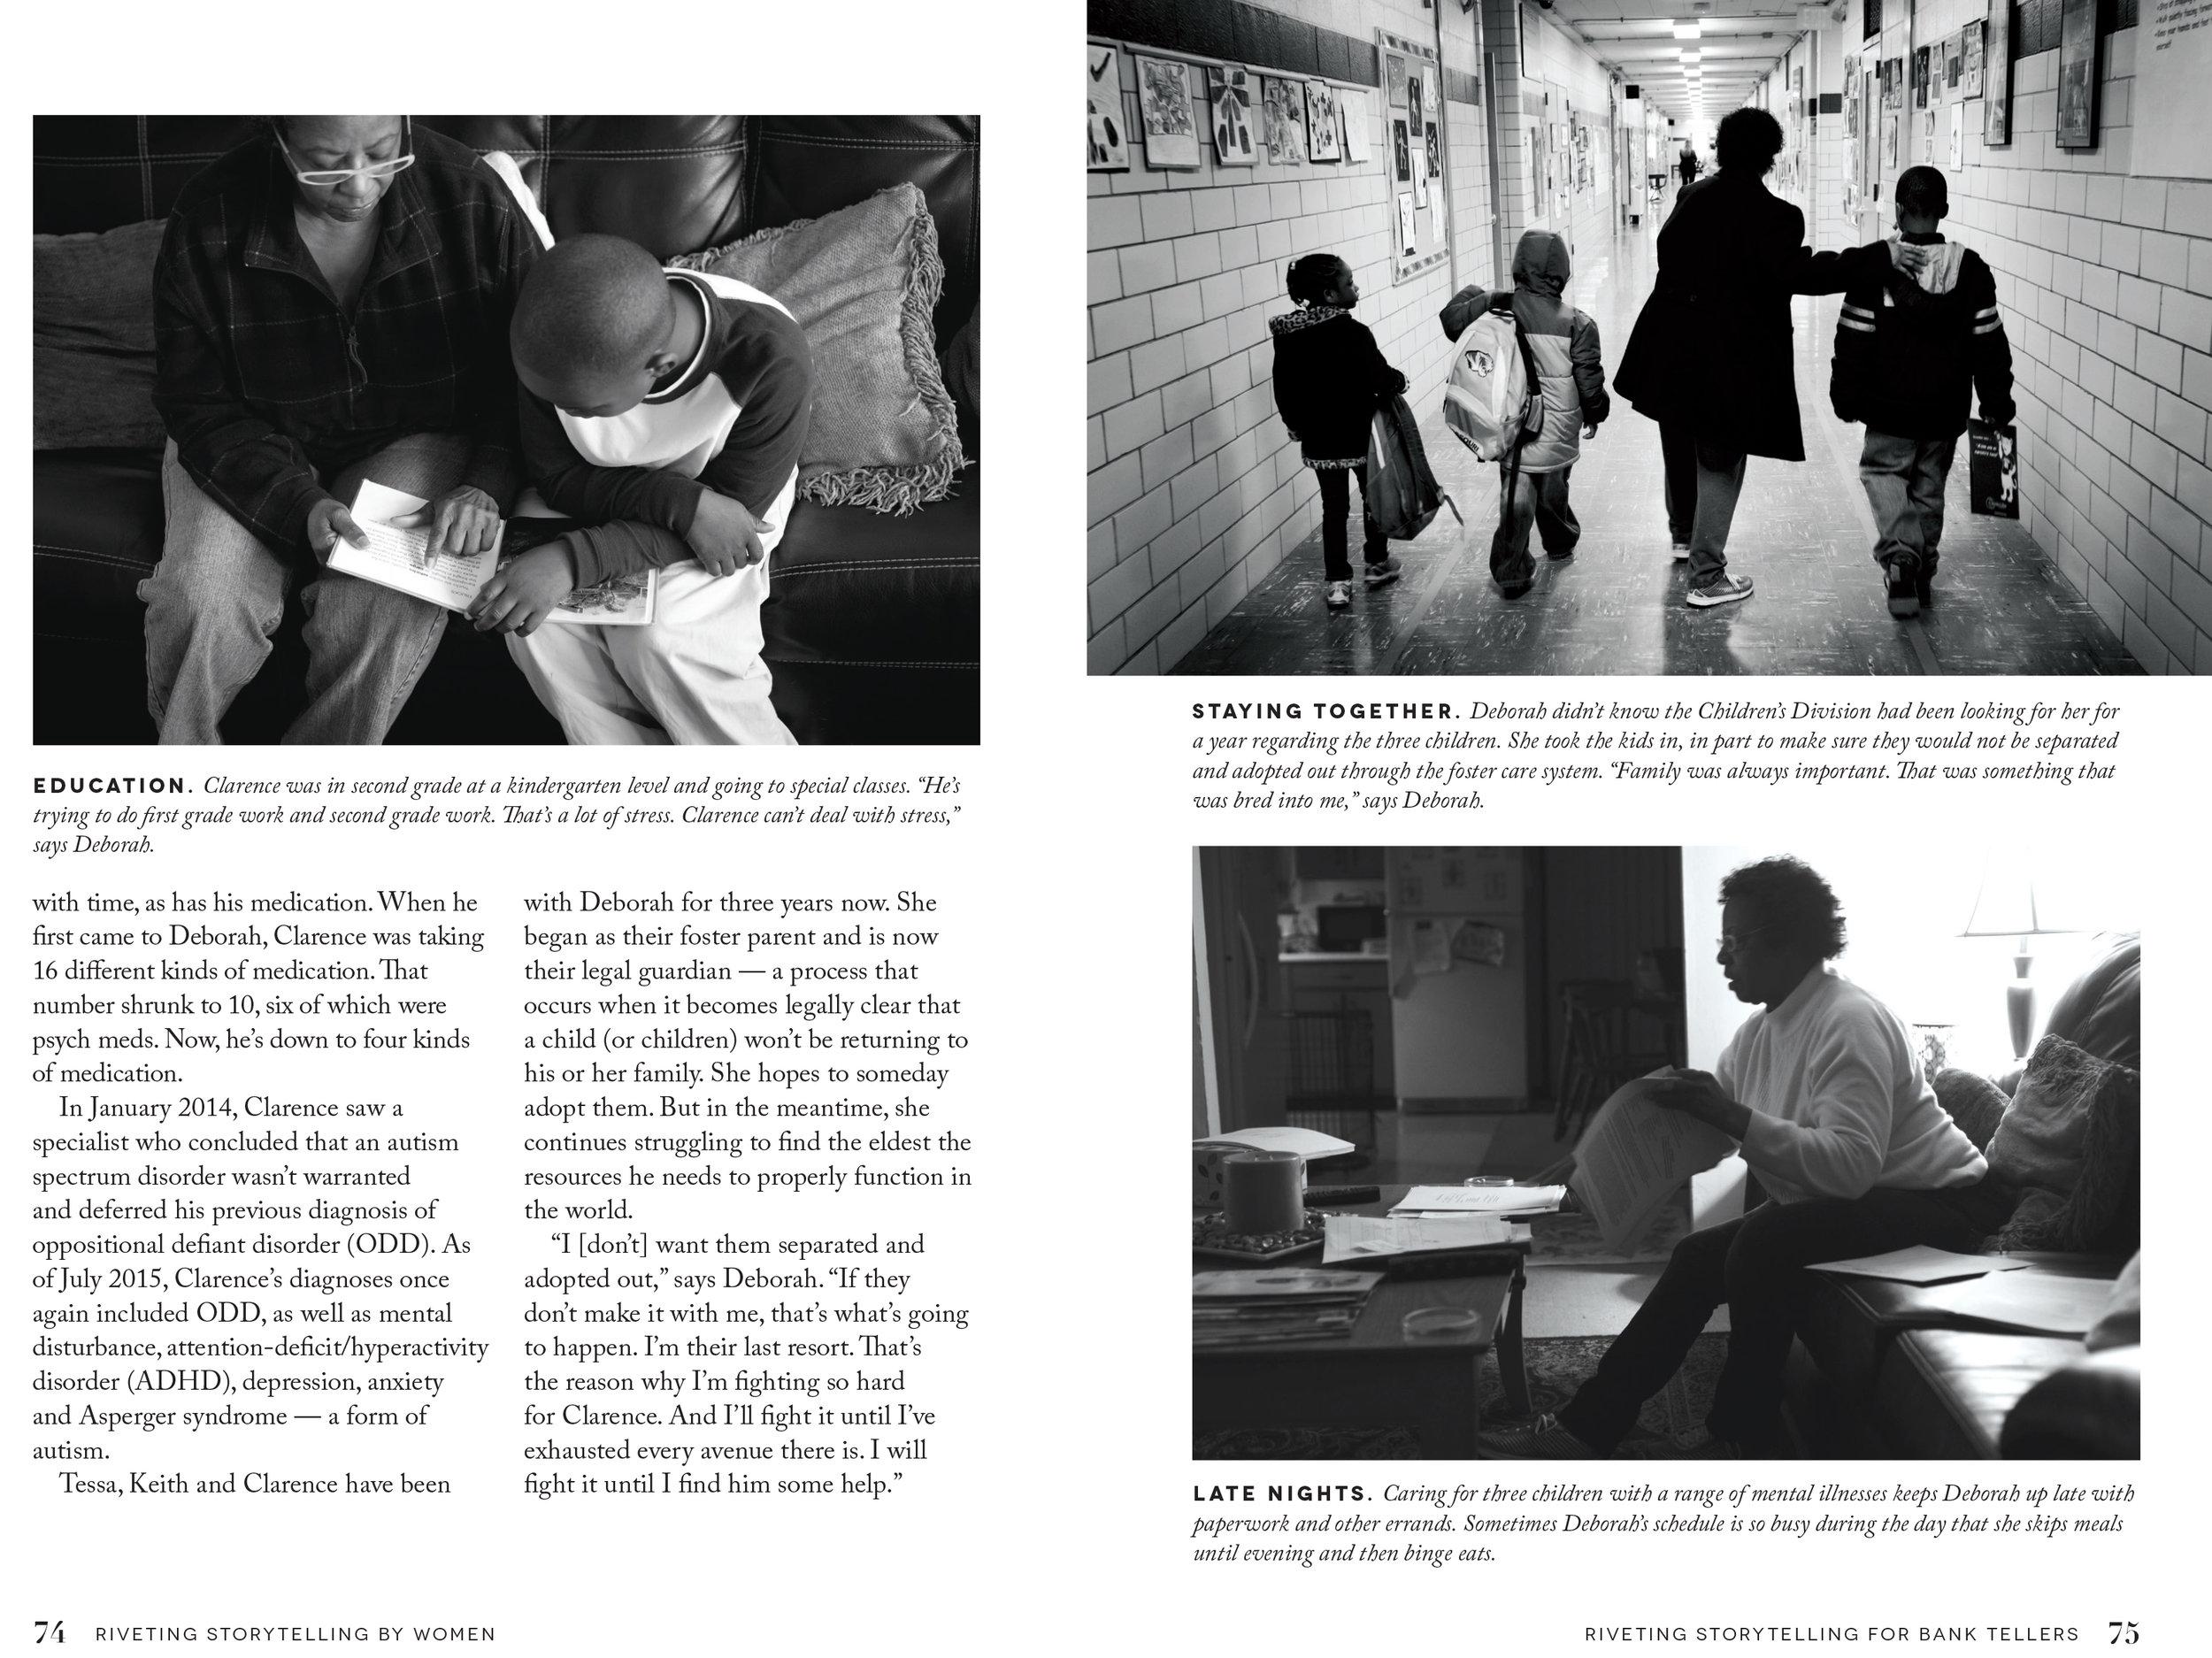 TheRiveter_Issue03_PhotoEssay-6.jpg